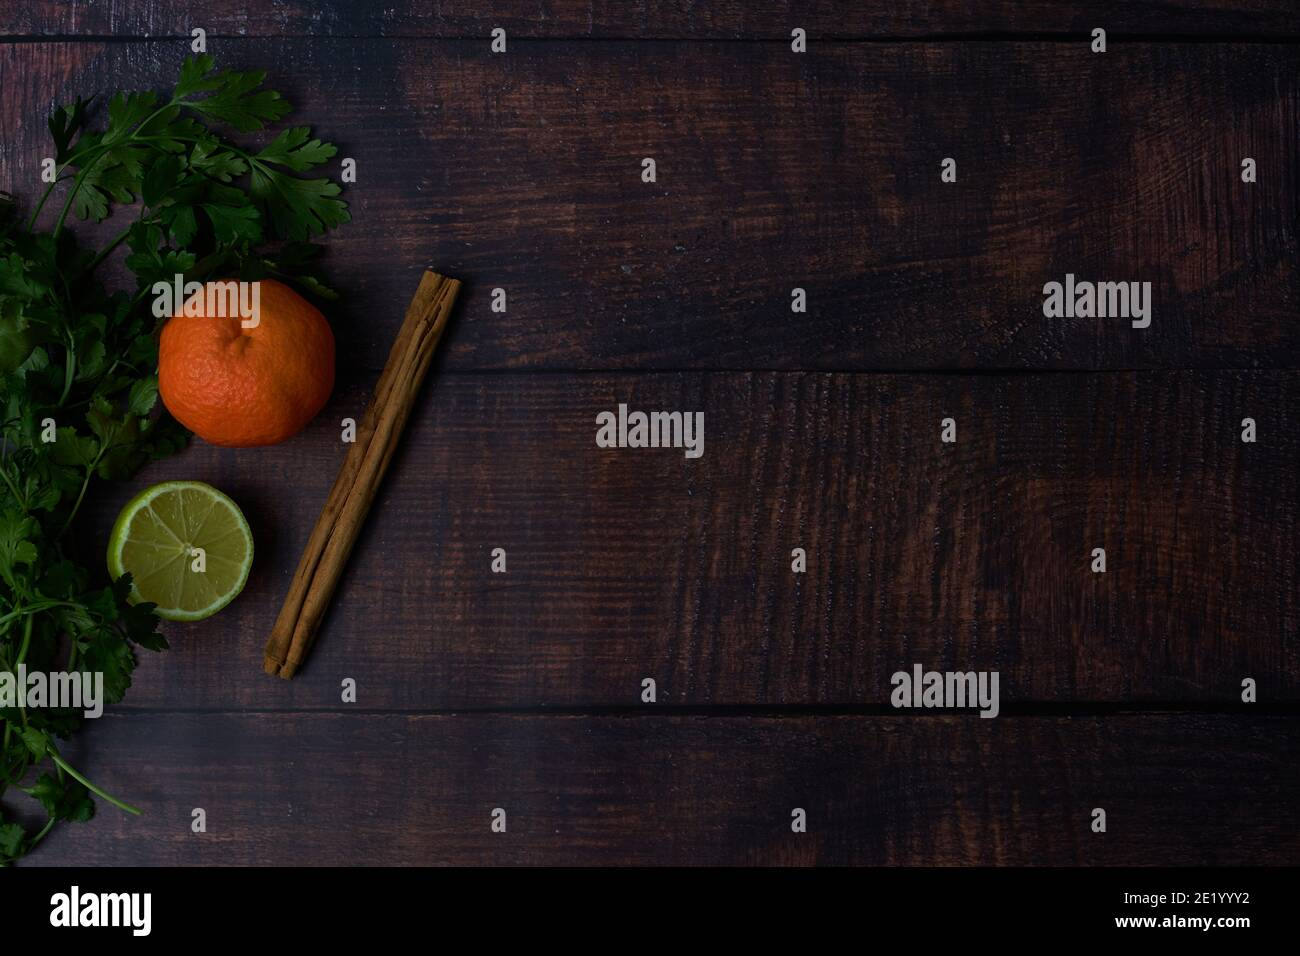 ingredients on wooden board, tangerine cinnamon parsley Stock Photo